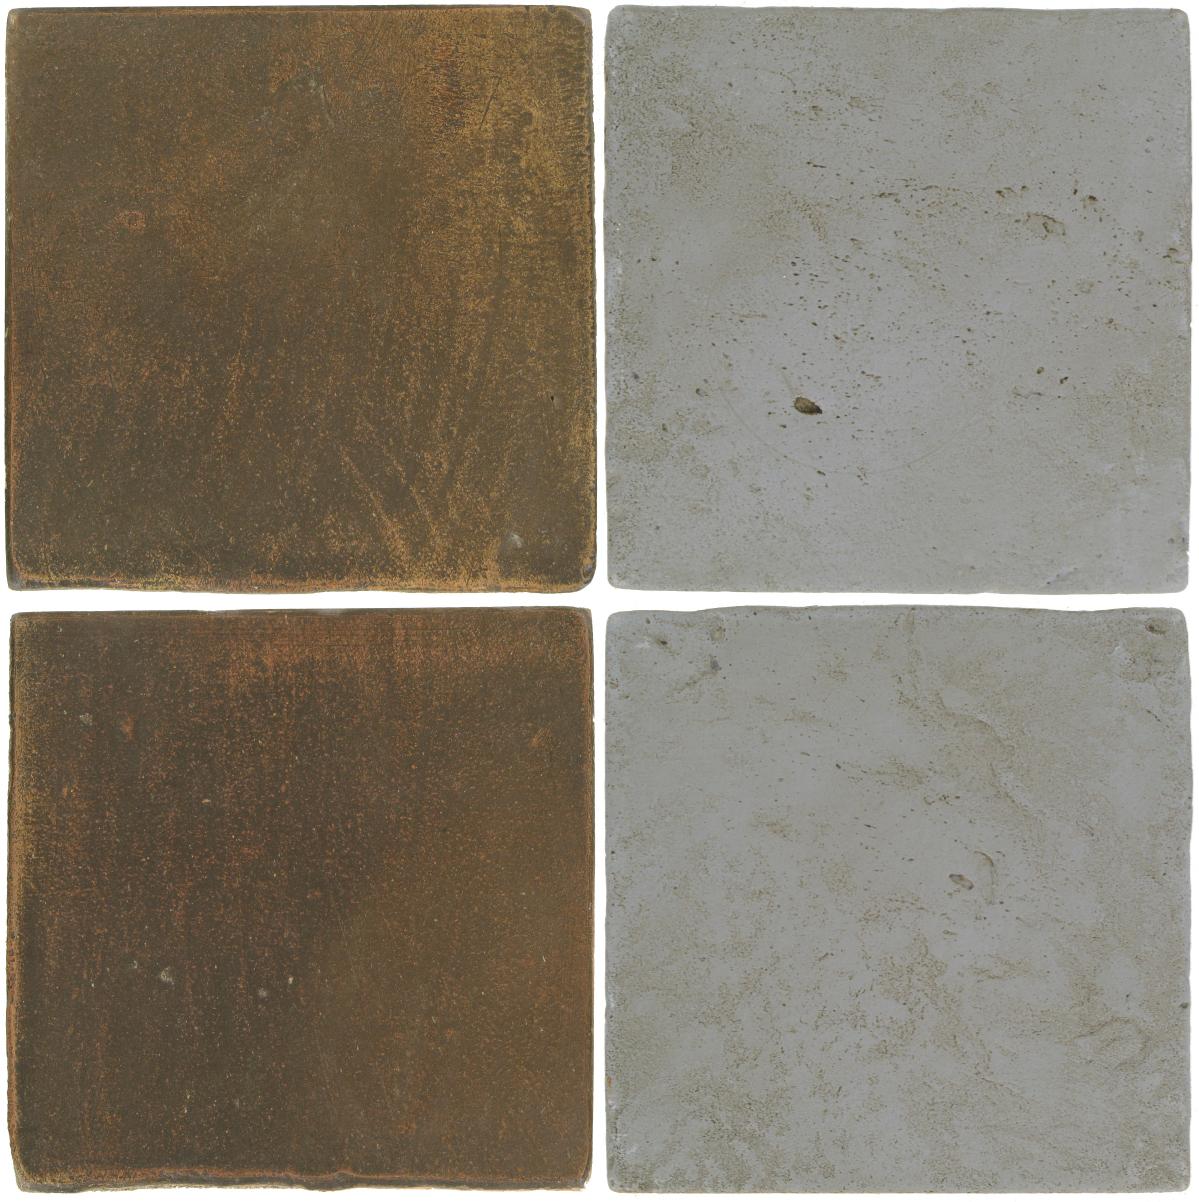 Pedralbes Antique Terracotta  2 Color Combinations  OHS-PSVN Verona Brown + VTG-PGOG Oyster Grey